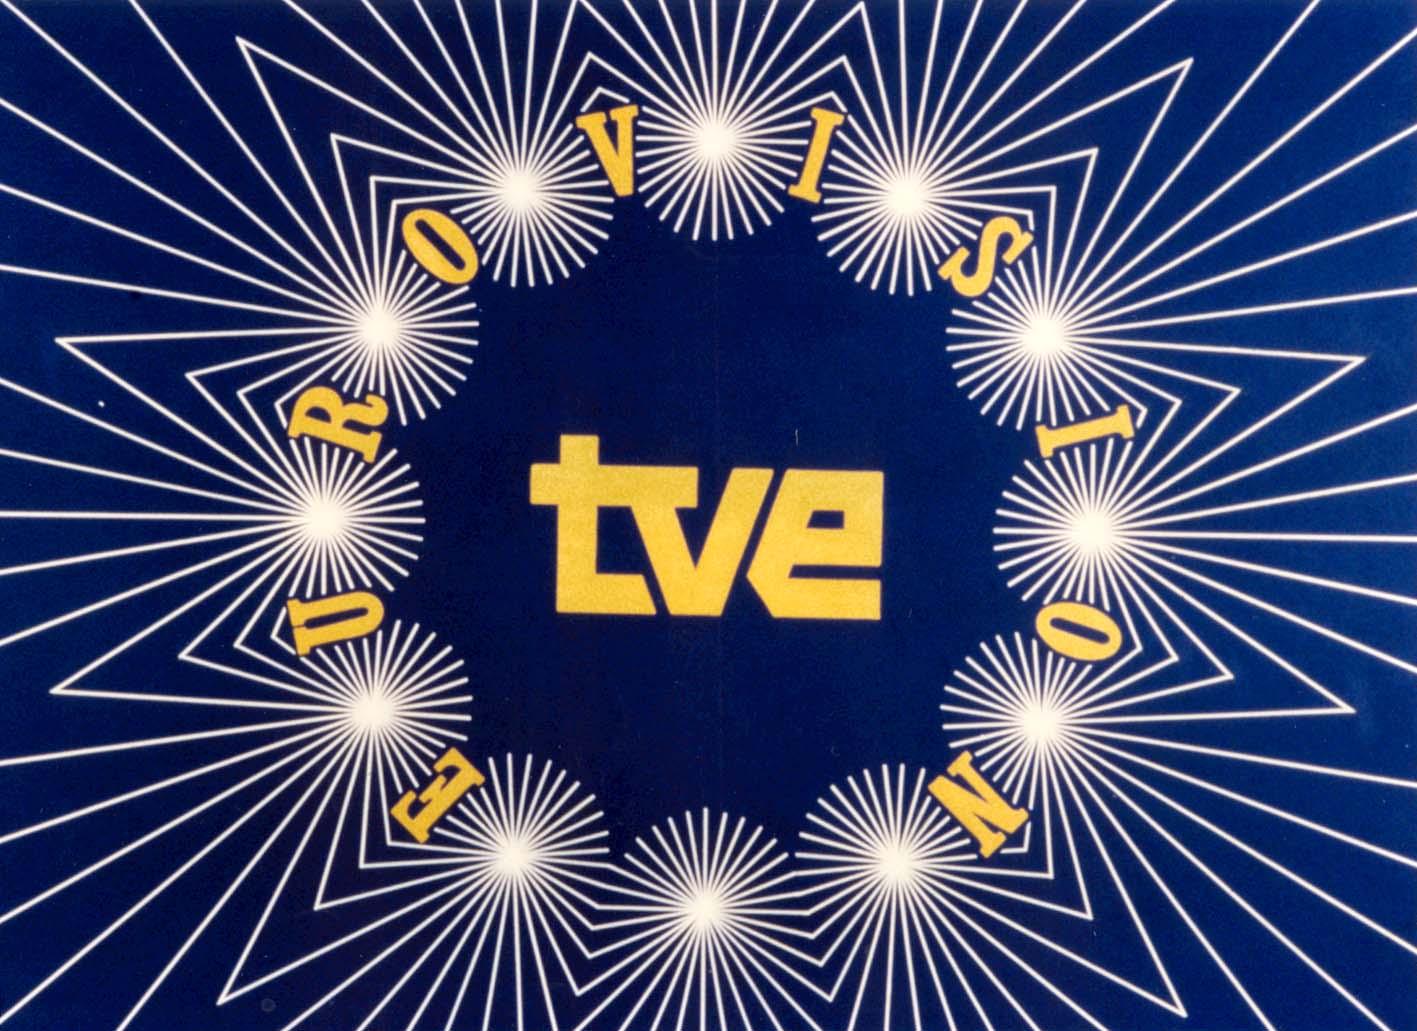 eurovisiontve